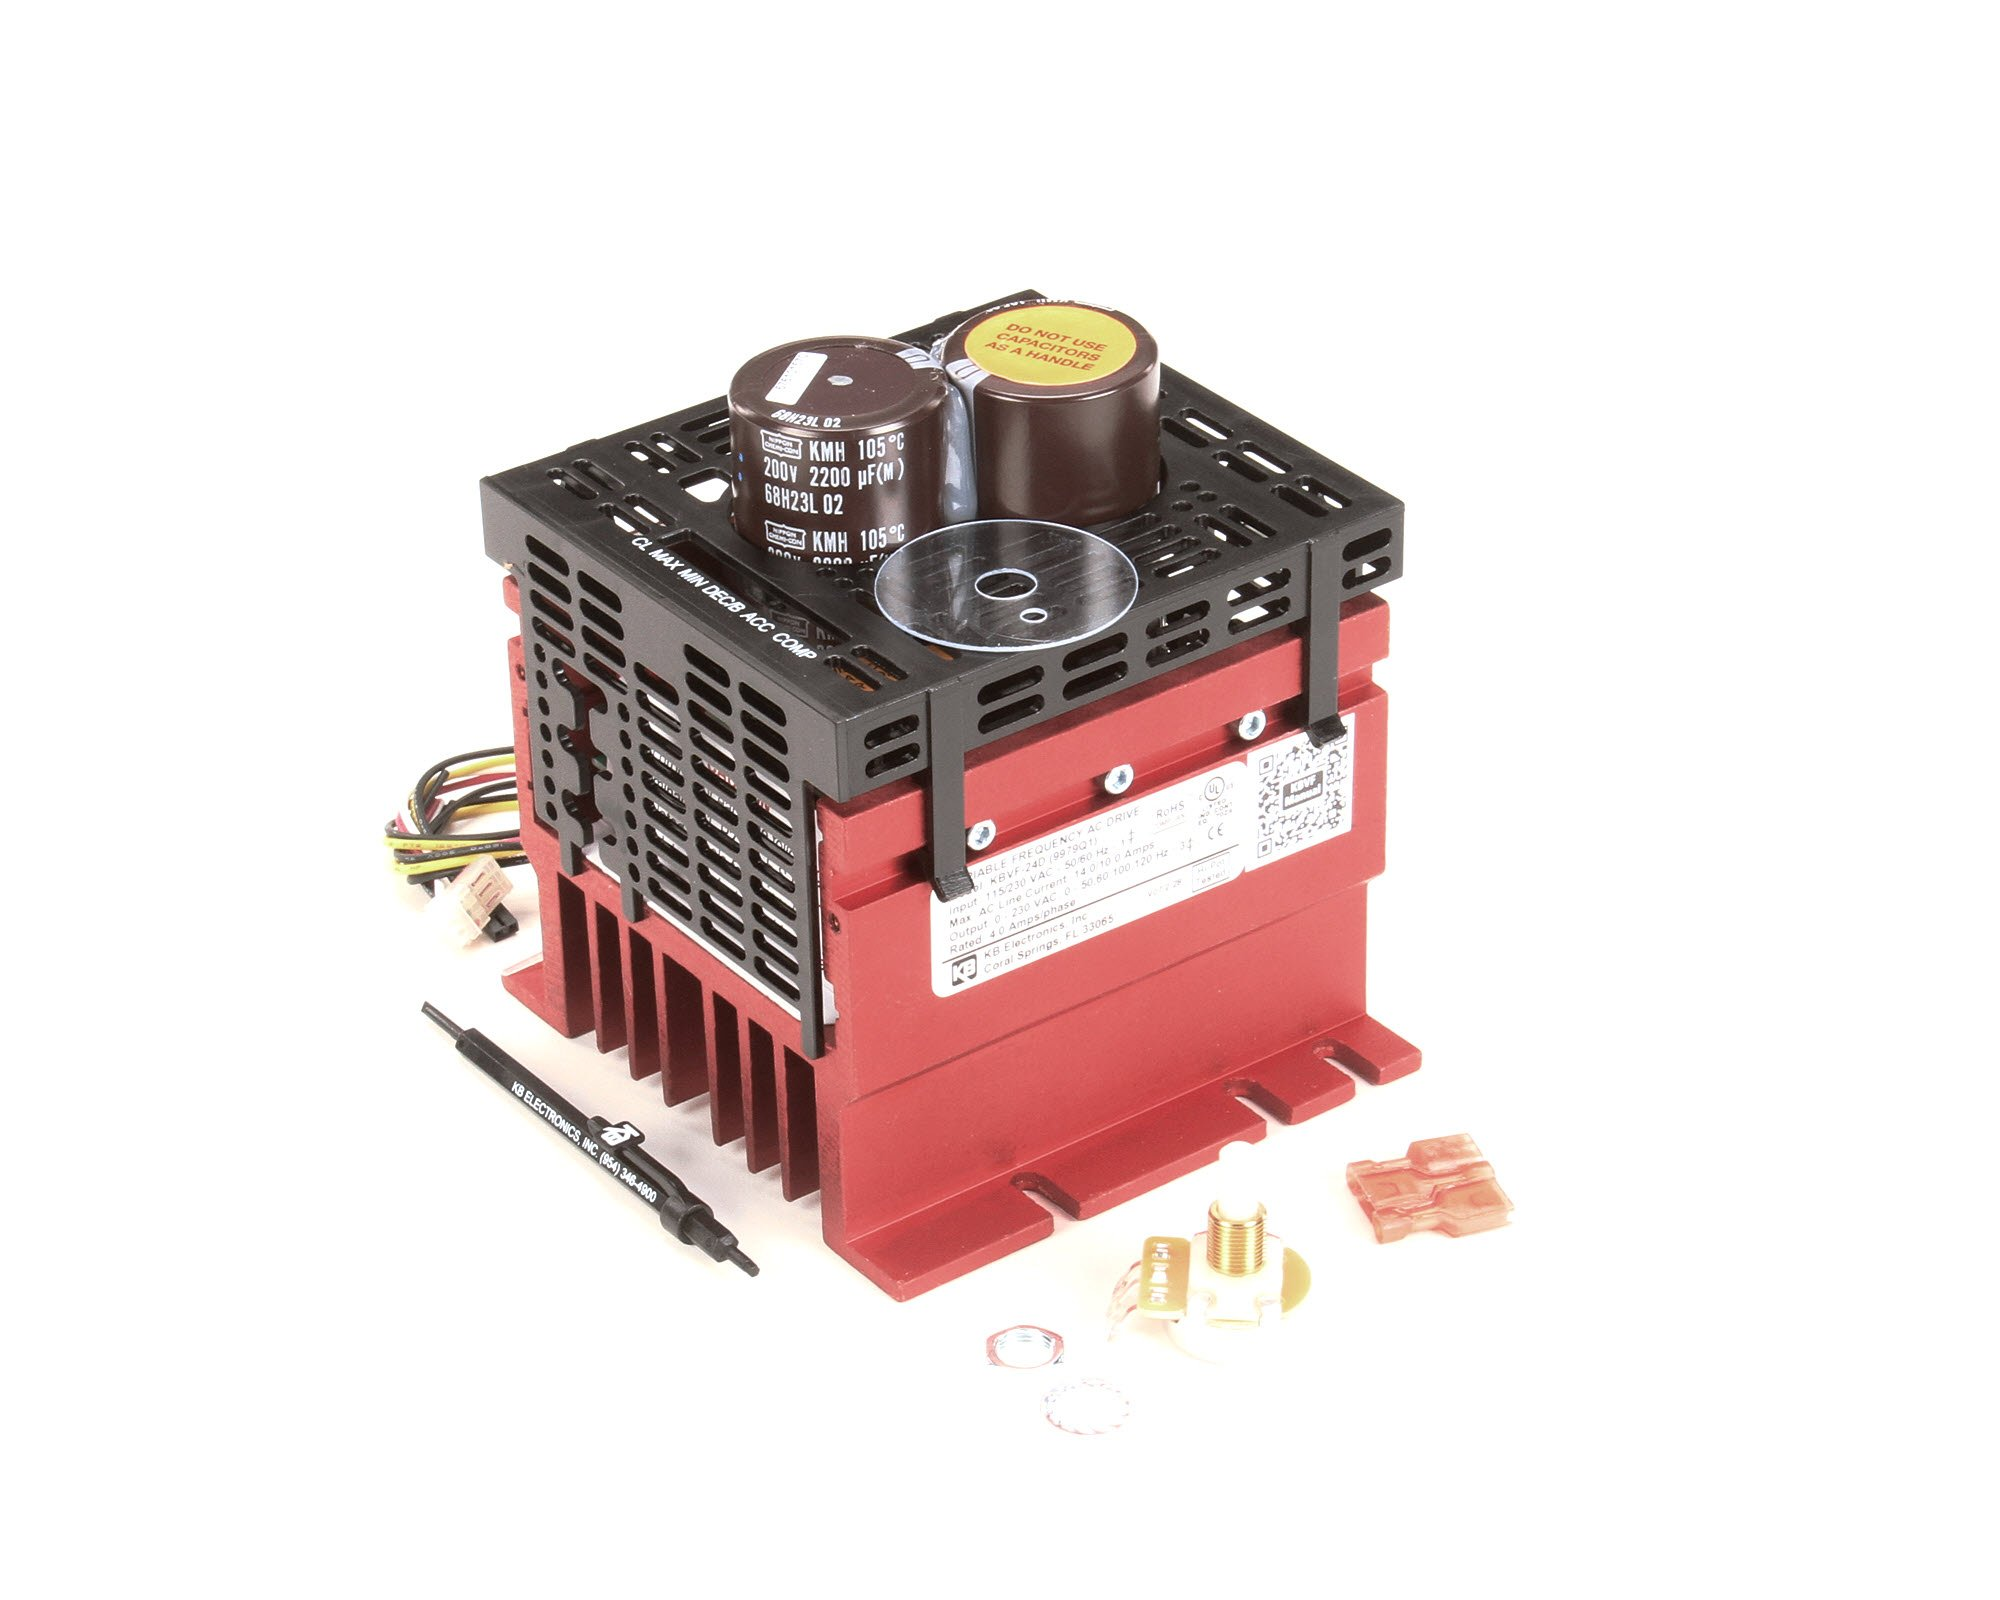 Avtec EL INV0301 Inverter, Freq Control, Kbvf-2